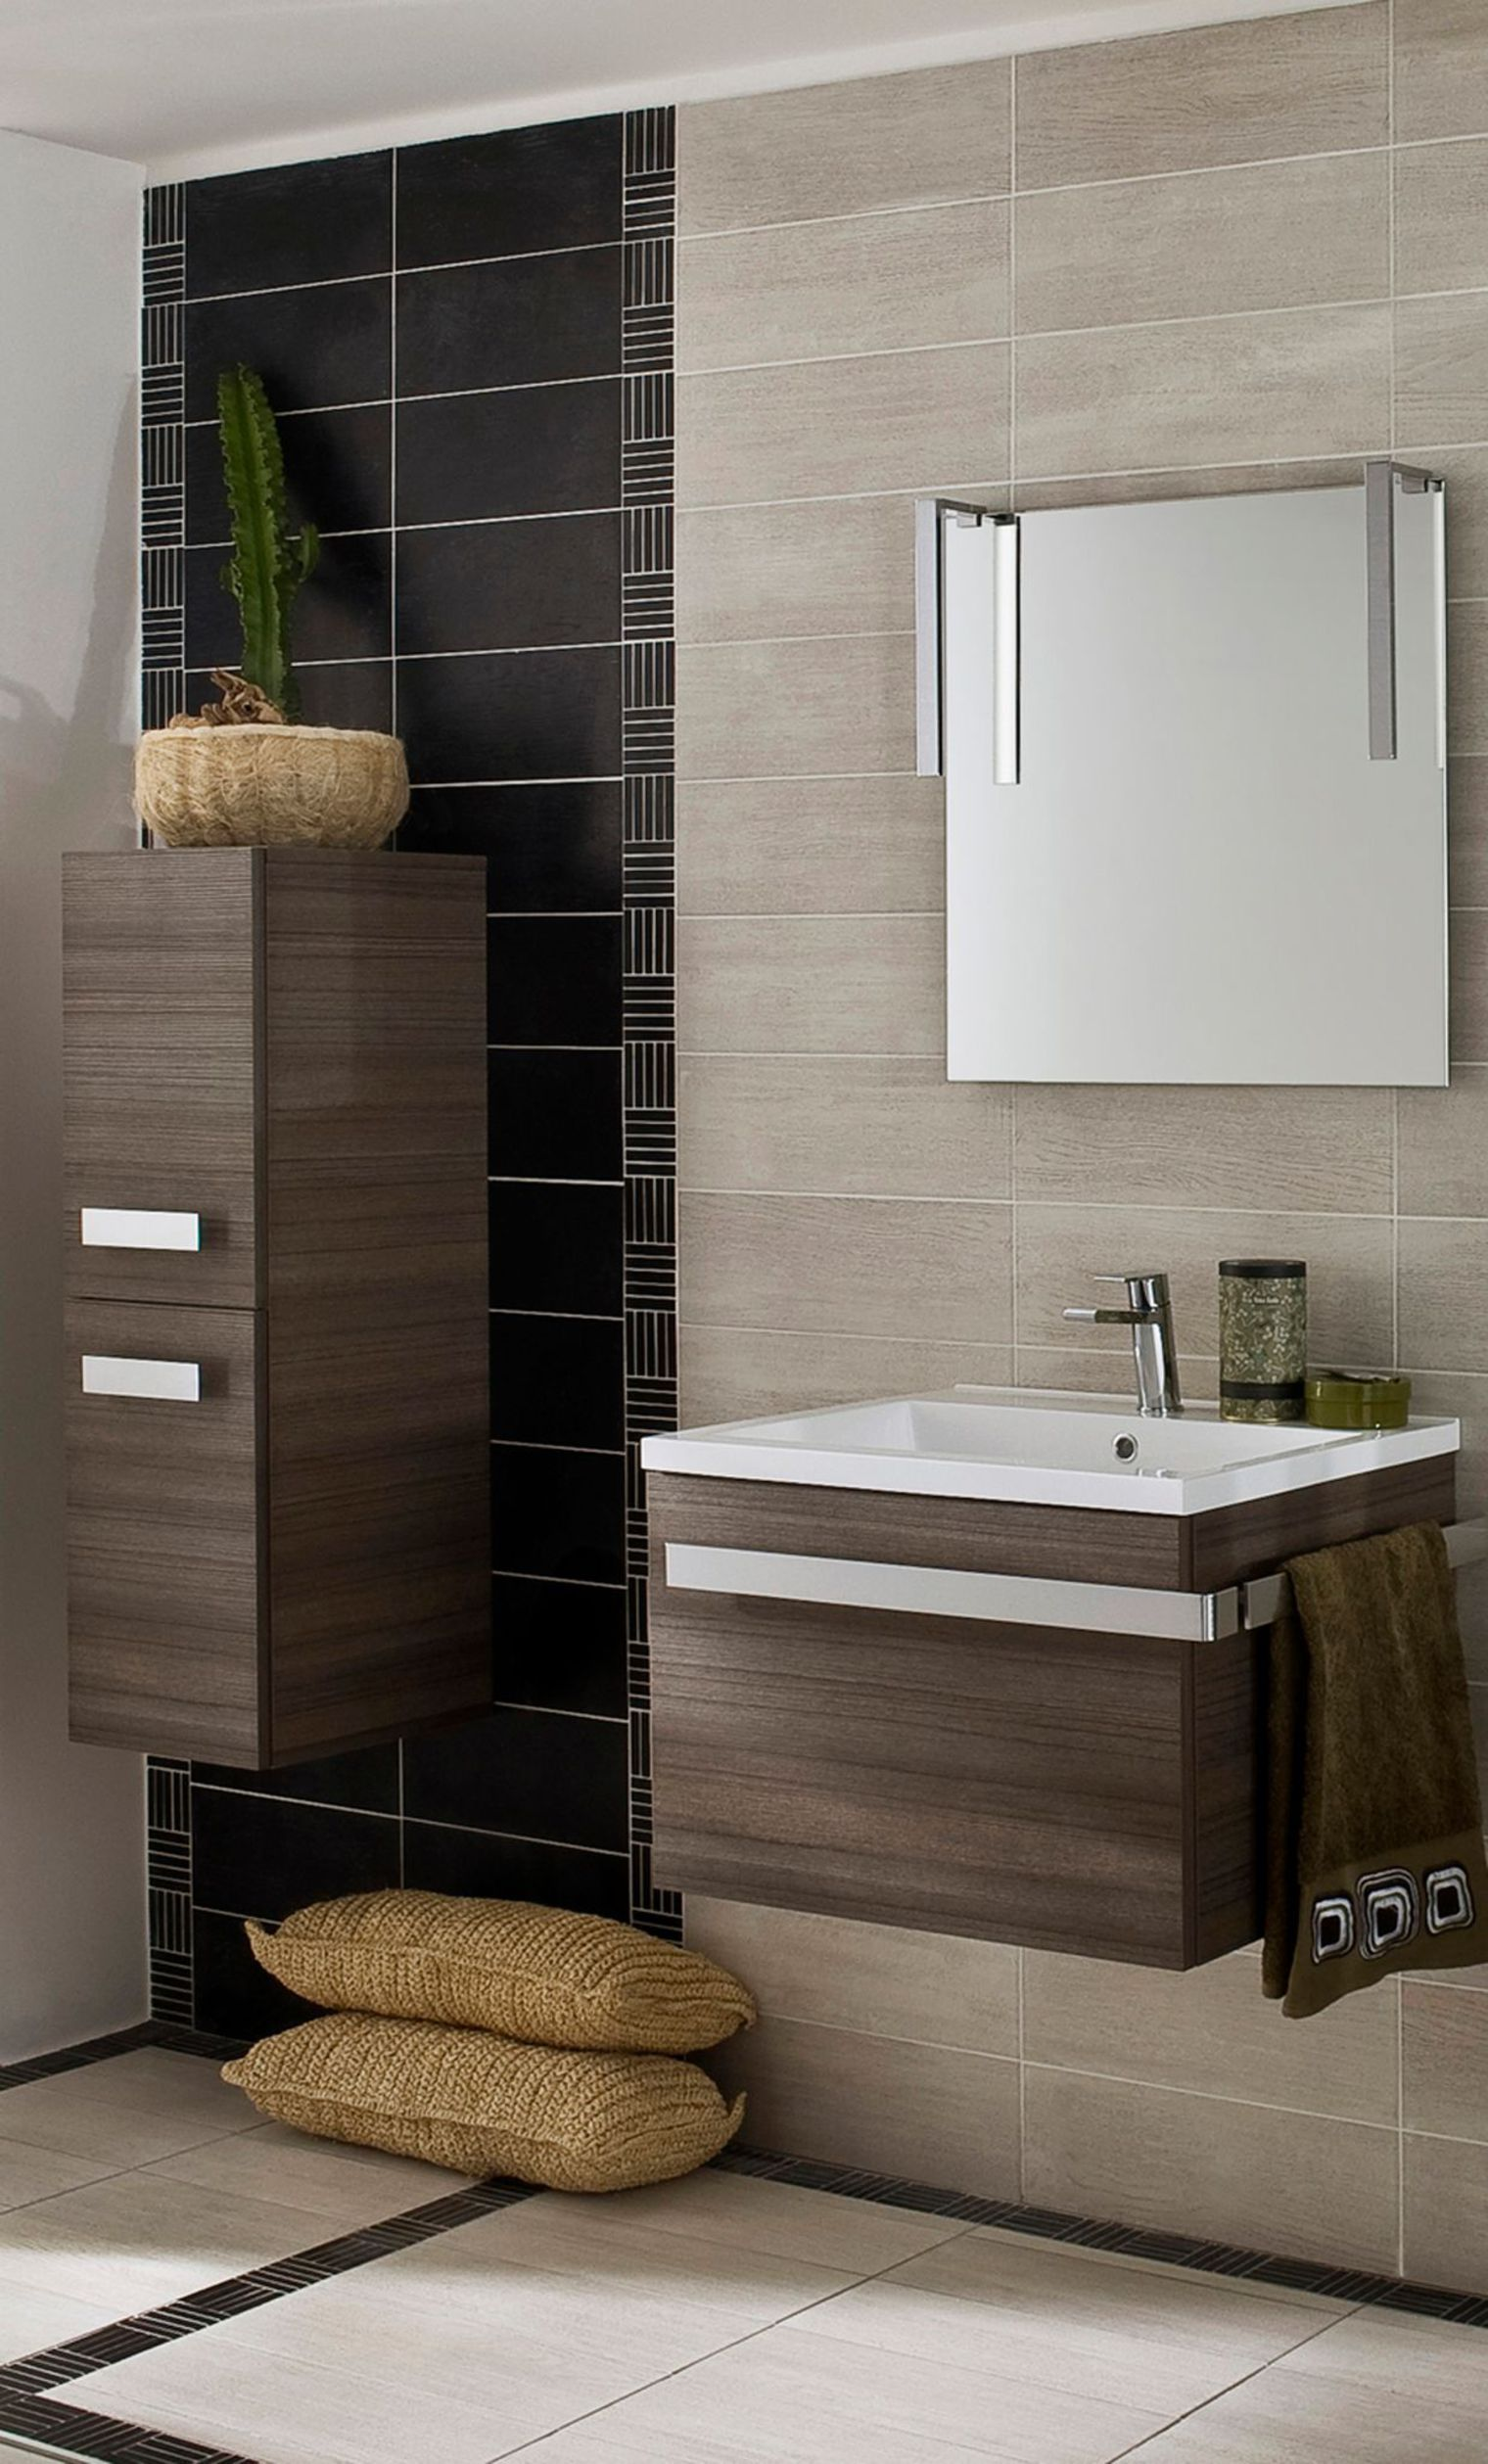 Tapis de salle de bain marron: tapis de salle bain ciuisine ...